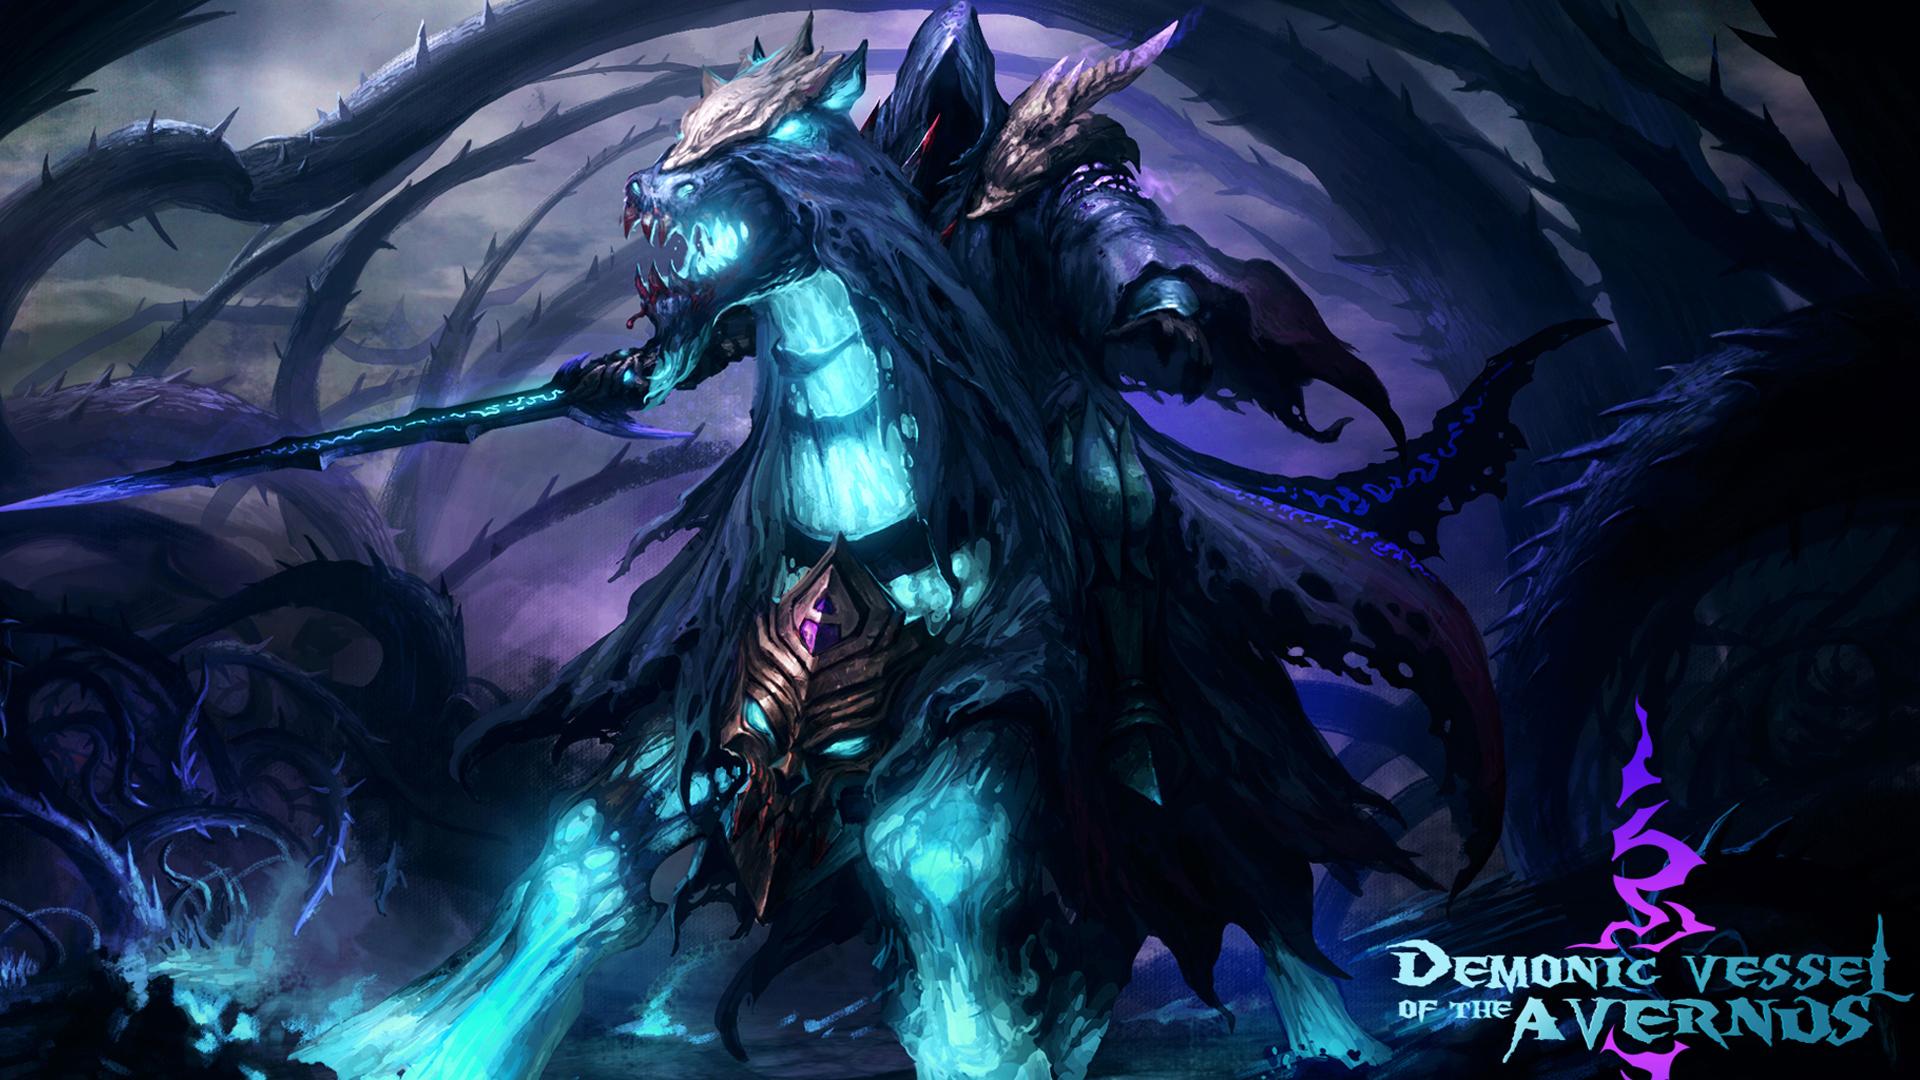 demonic vessel of the avernus set dota 2 game hd wallpaper 1920x1080 1920x1080